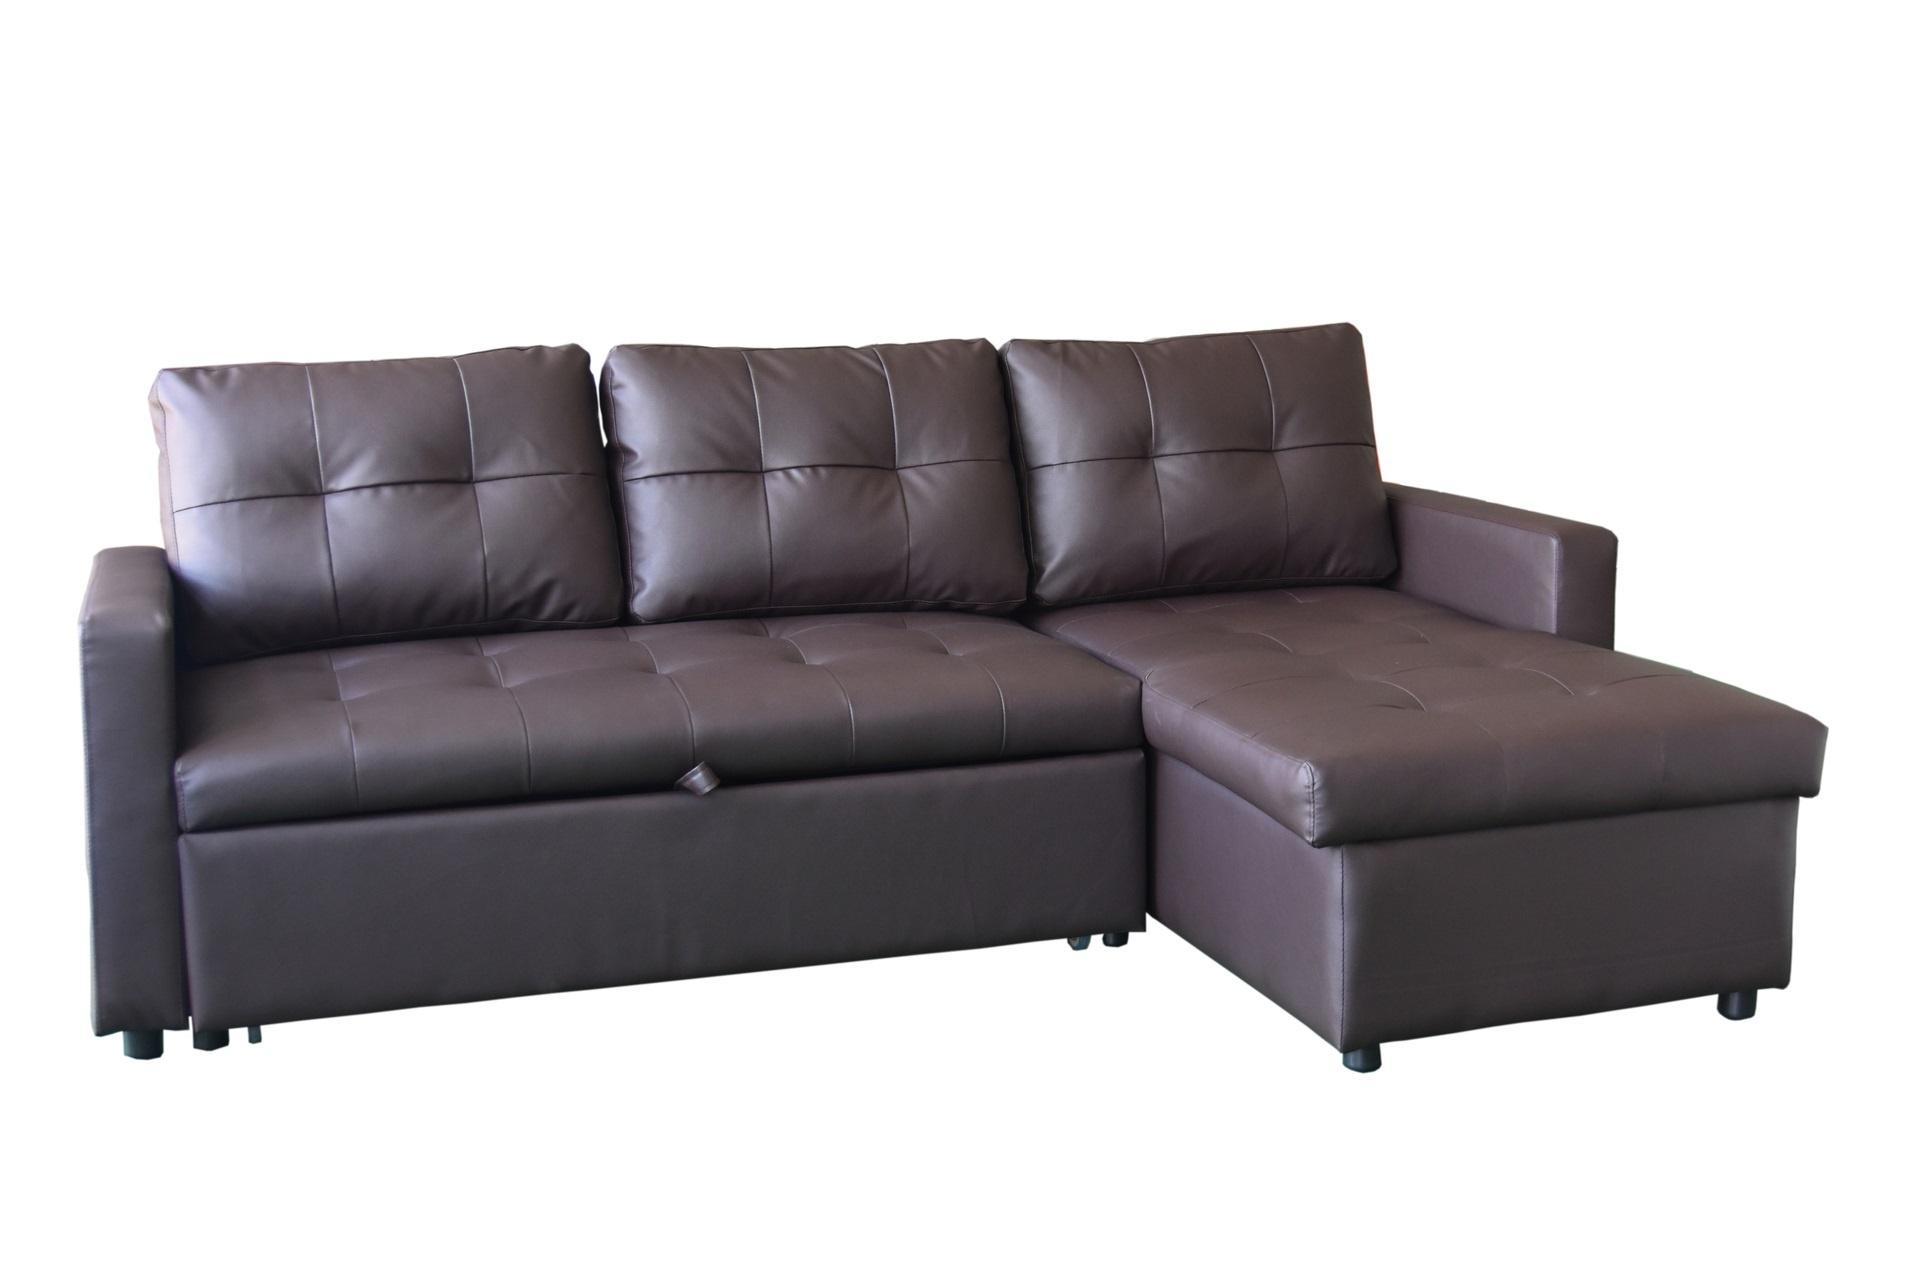 milano leather dual facing corner sofa group black arm singapore portabello interiors 3 seater